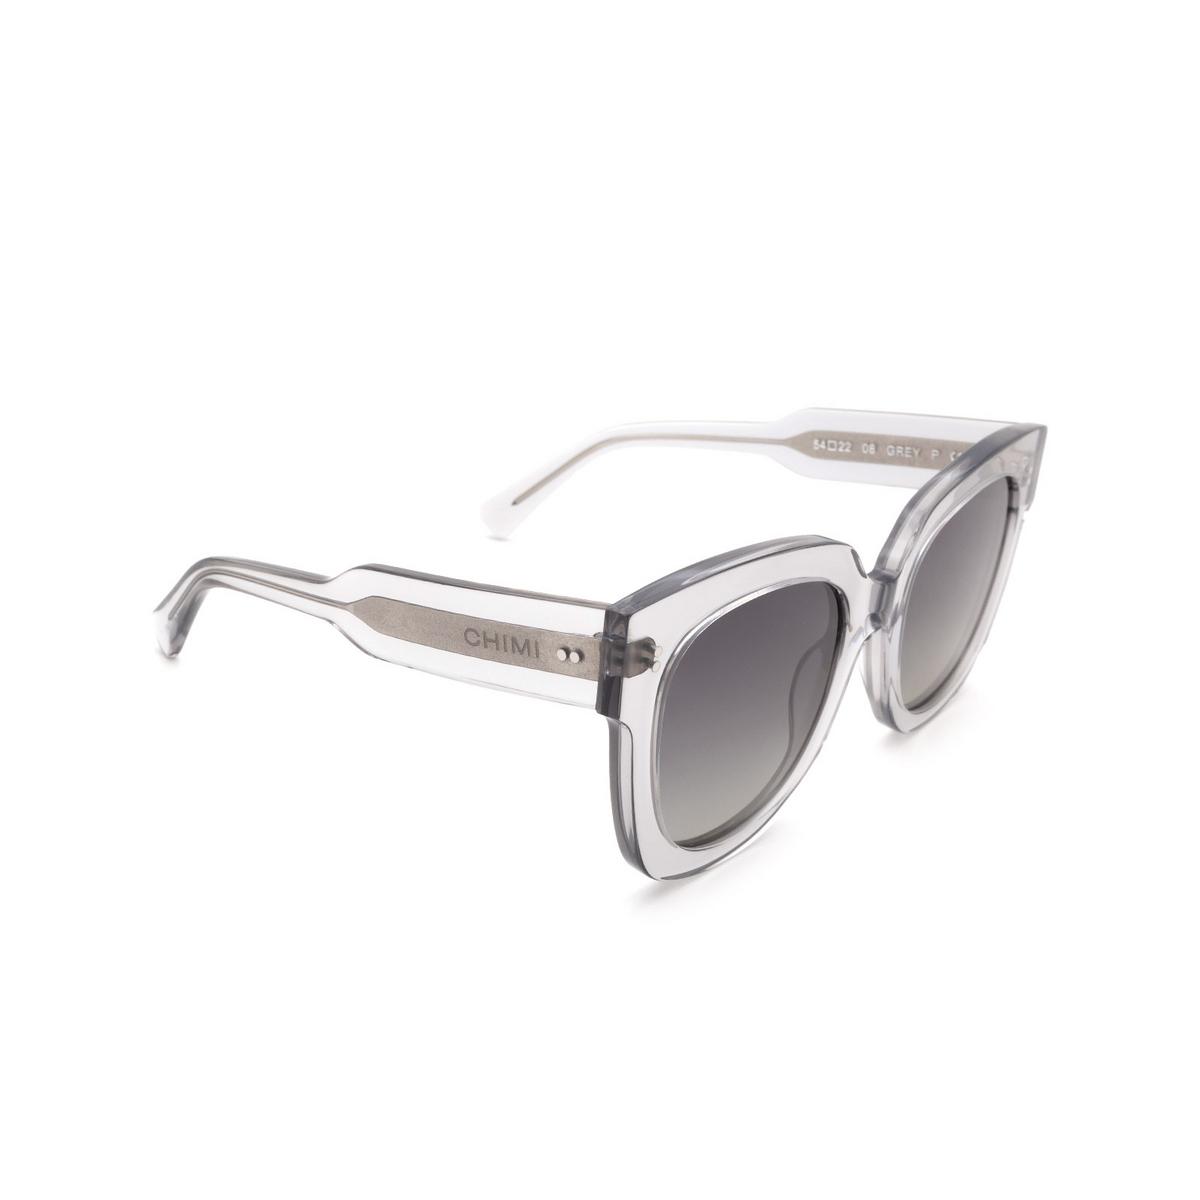 Chimi® Square Sunglasses: 08 color Grey - three-quarters view.